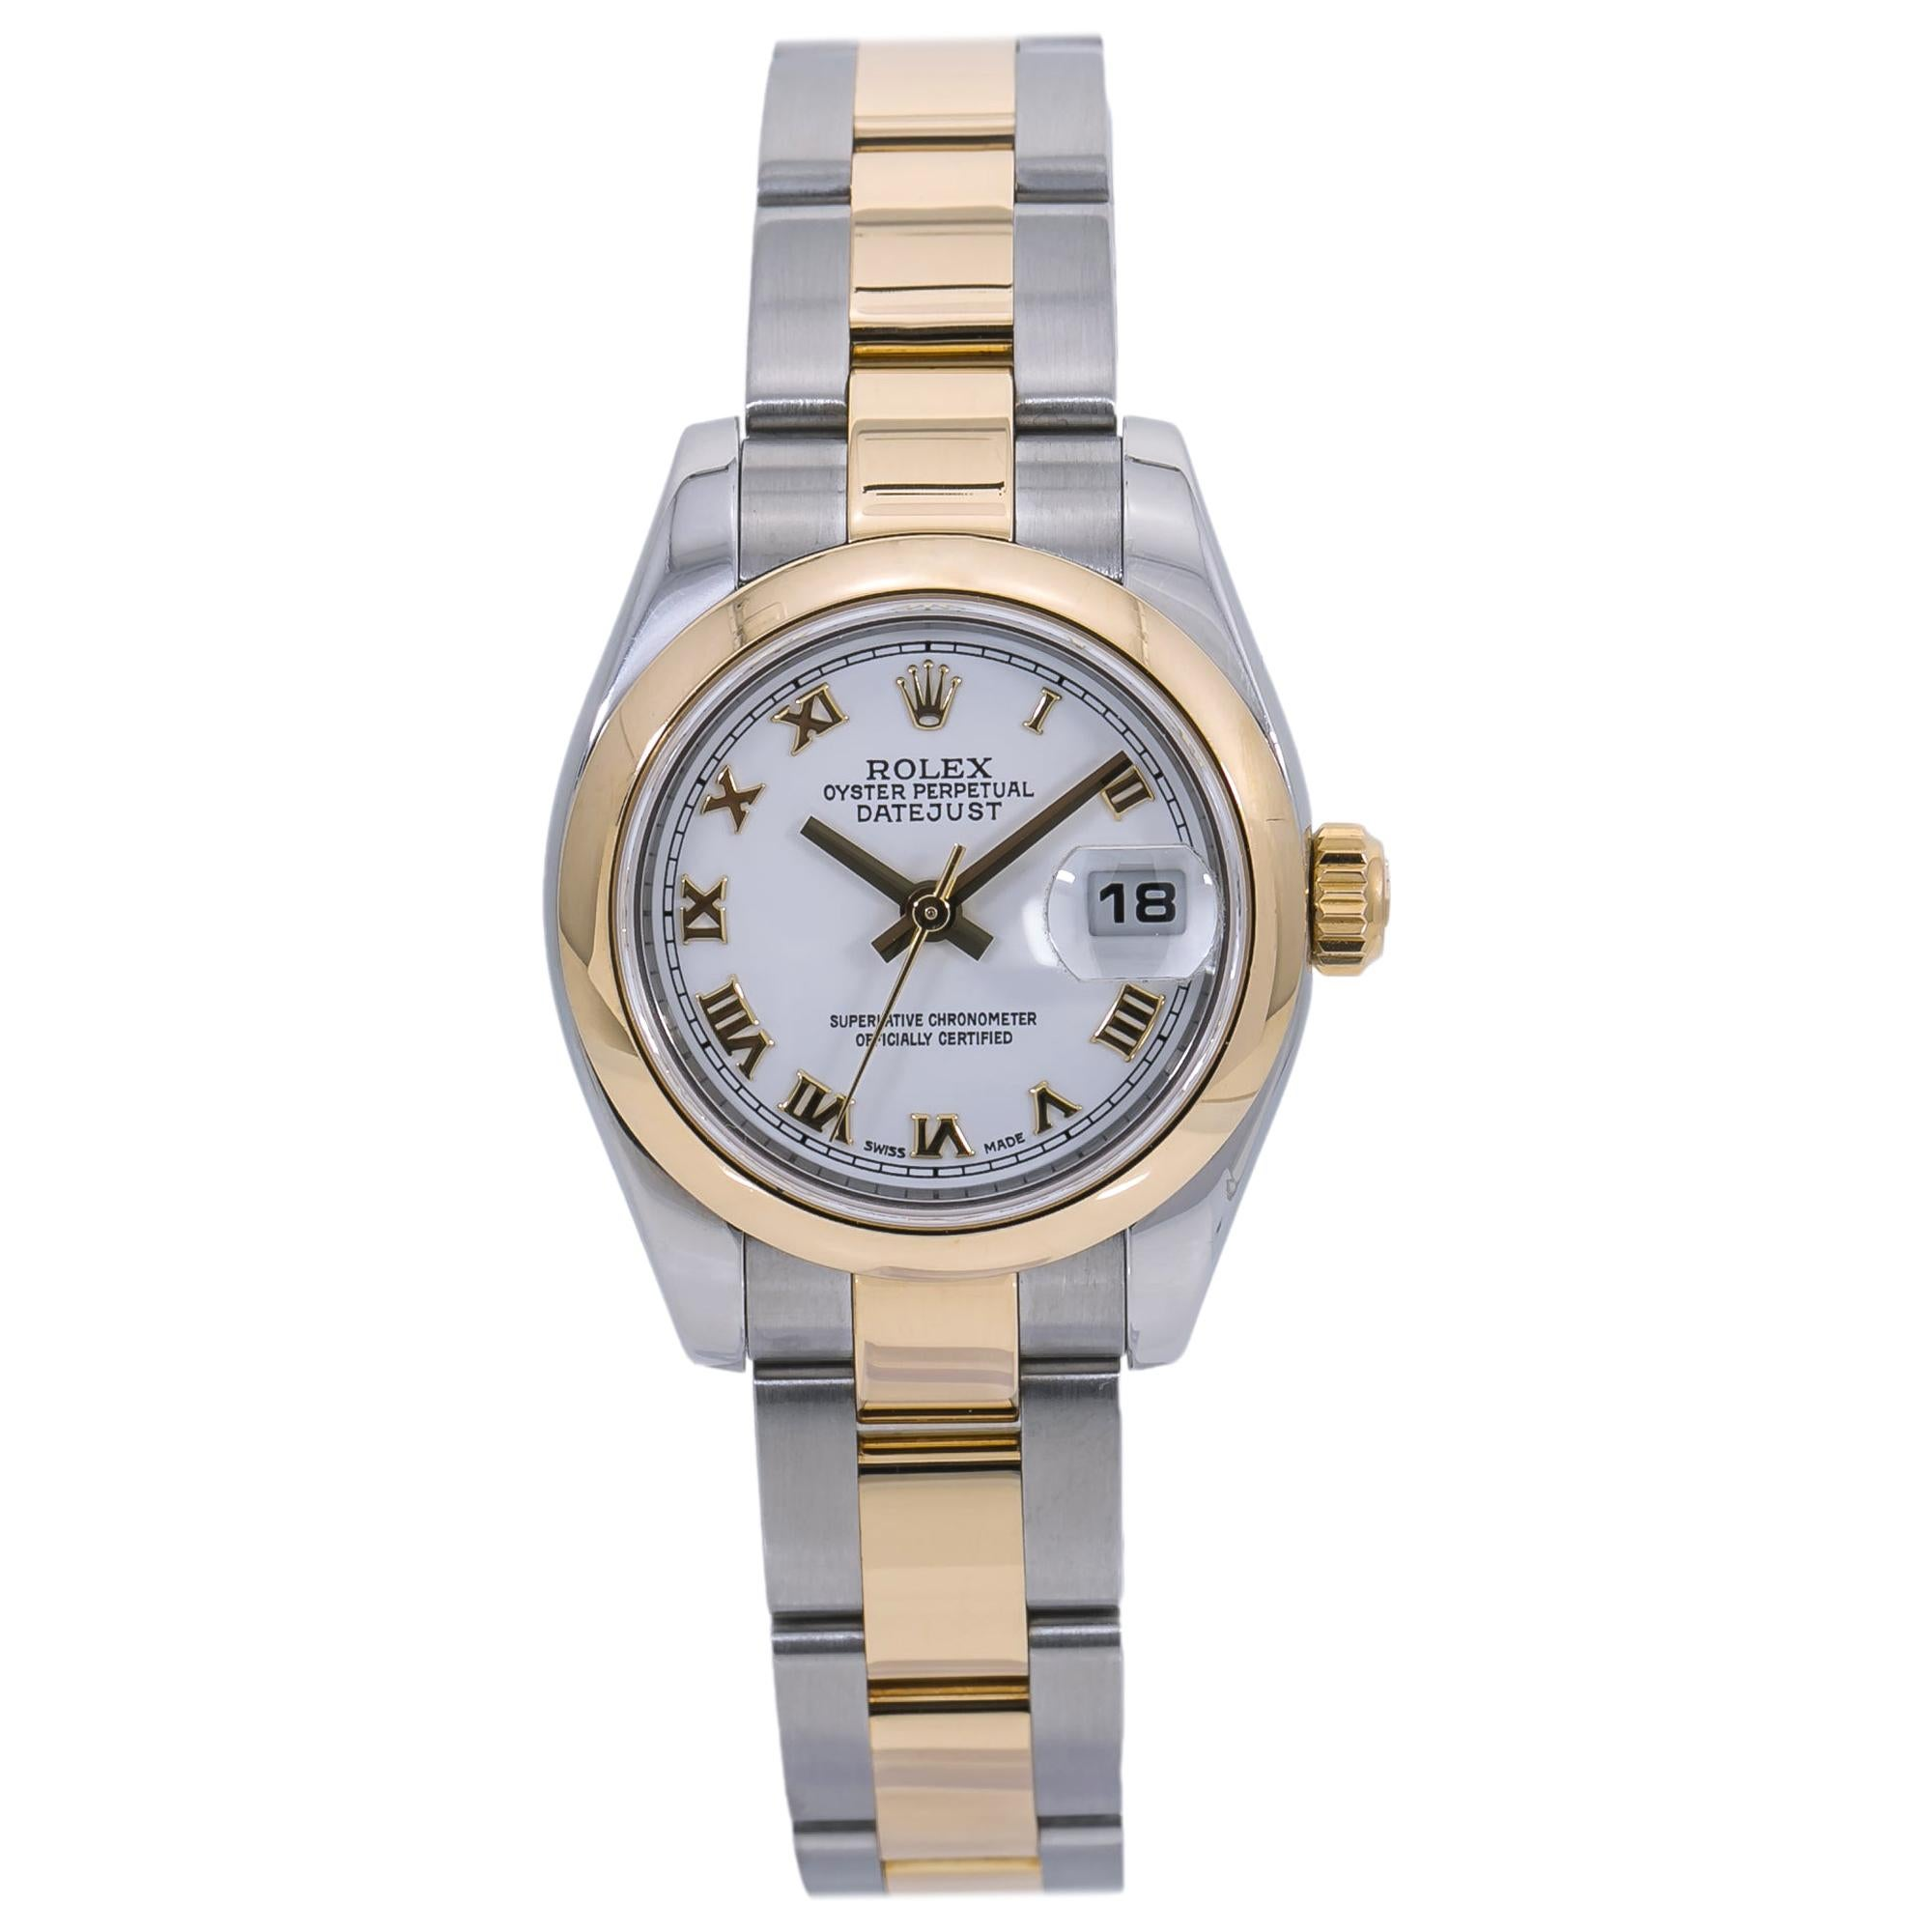 Rolex Datejust 179163 Lady's Automatic Watch Oyster Bracelet 18k Two-Tone